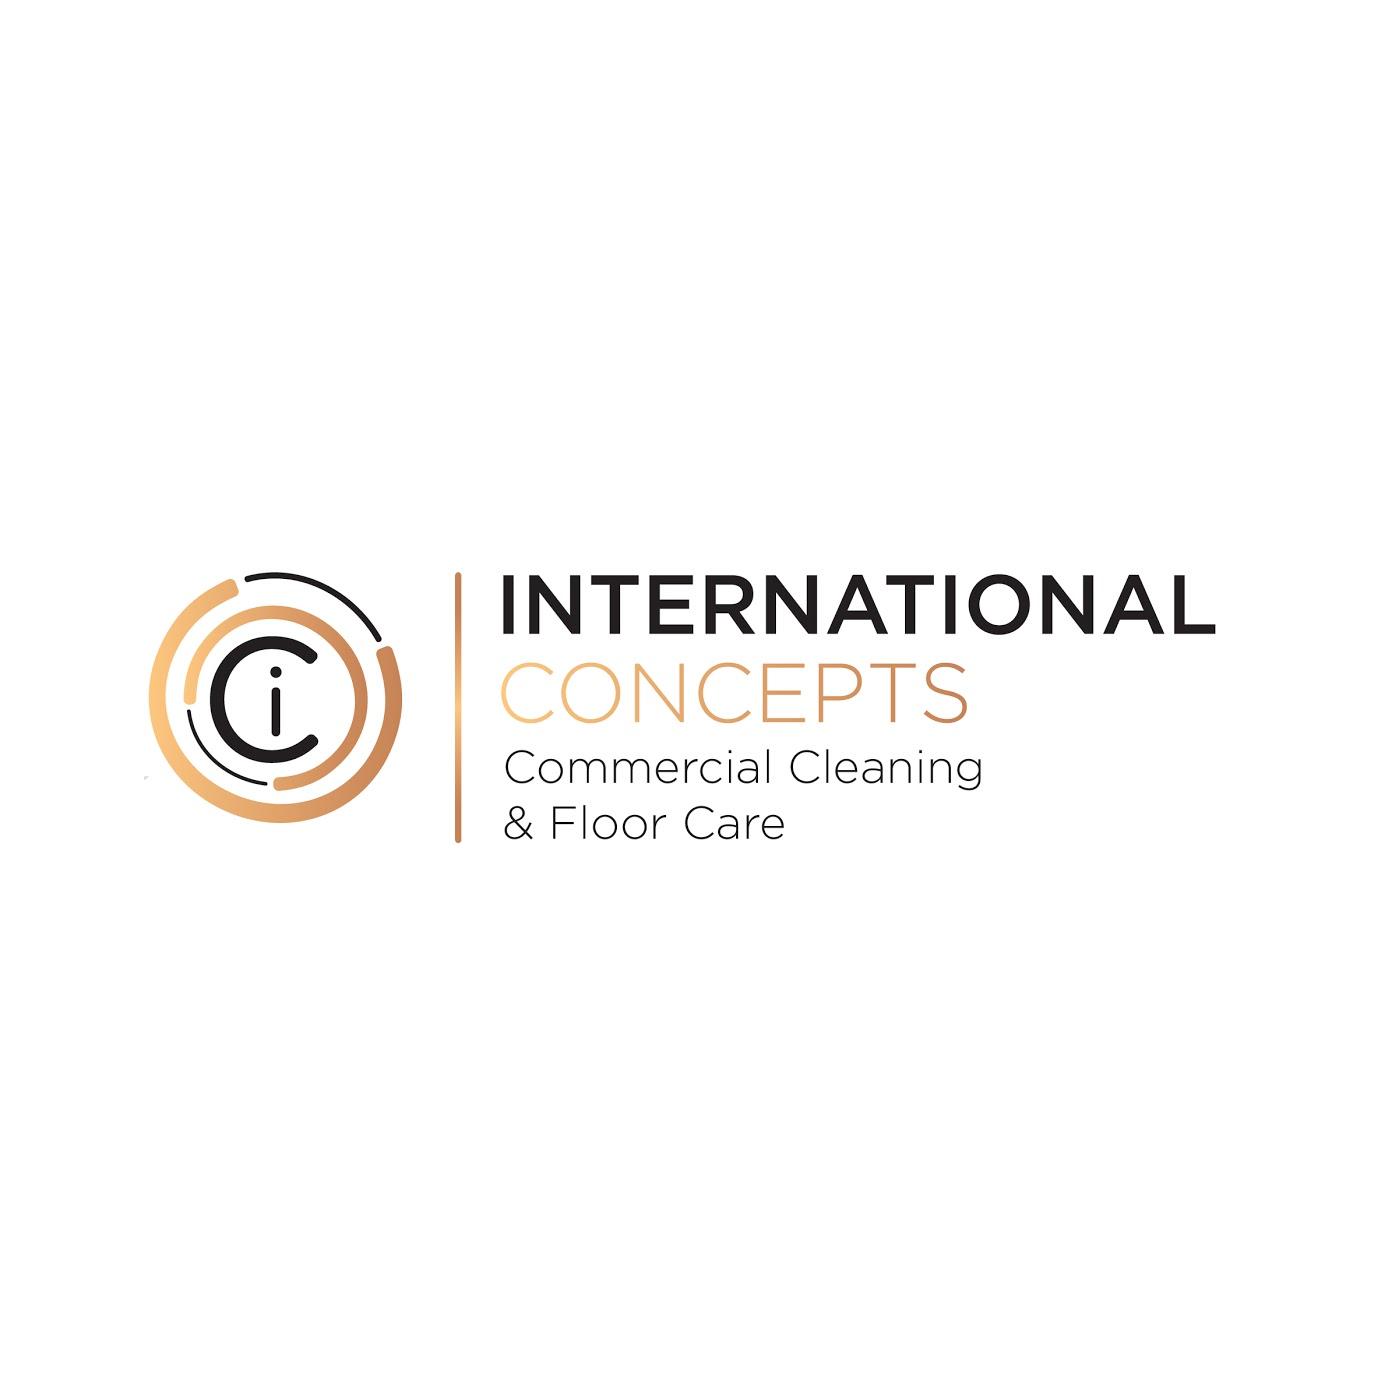 International Concepts